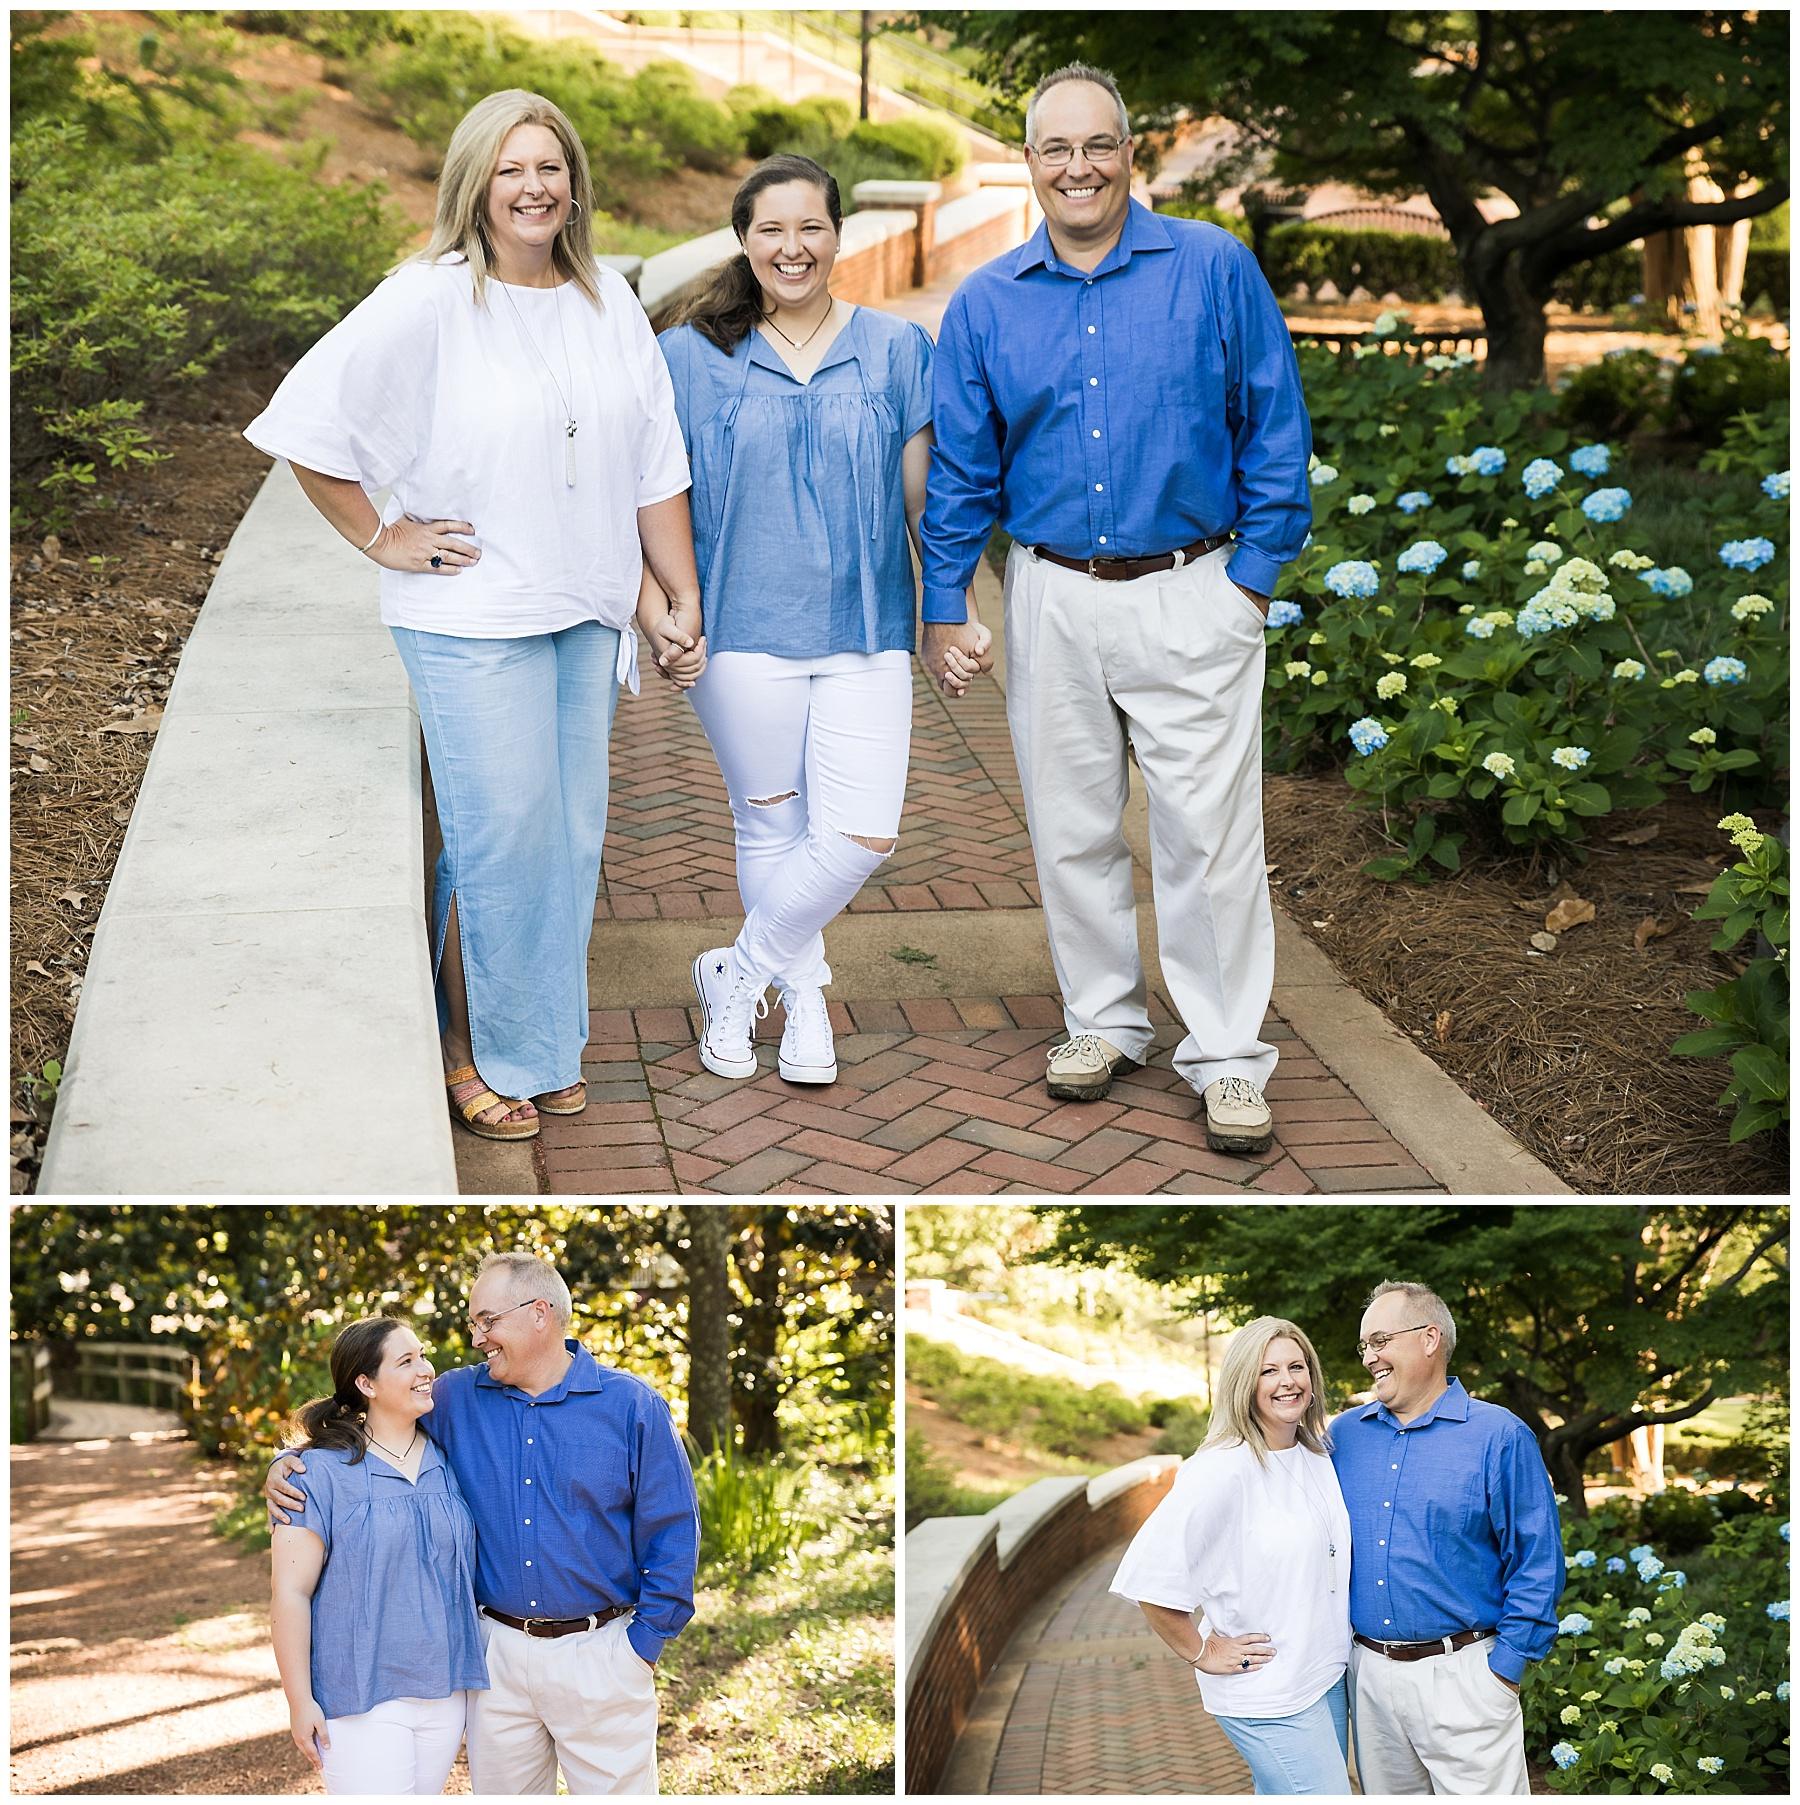 family portrait photographer auburn alabama arboretum